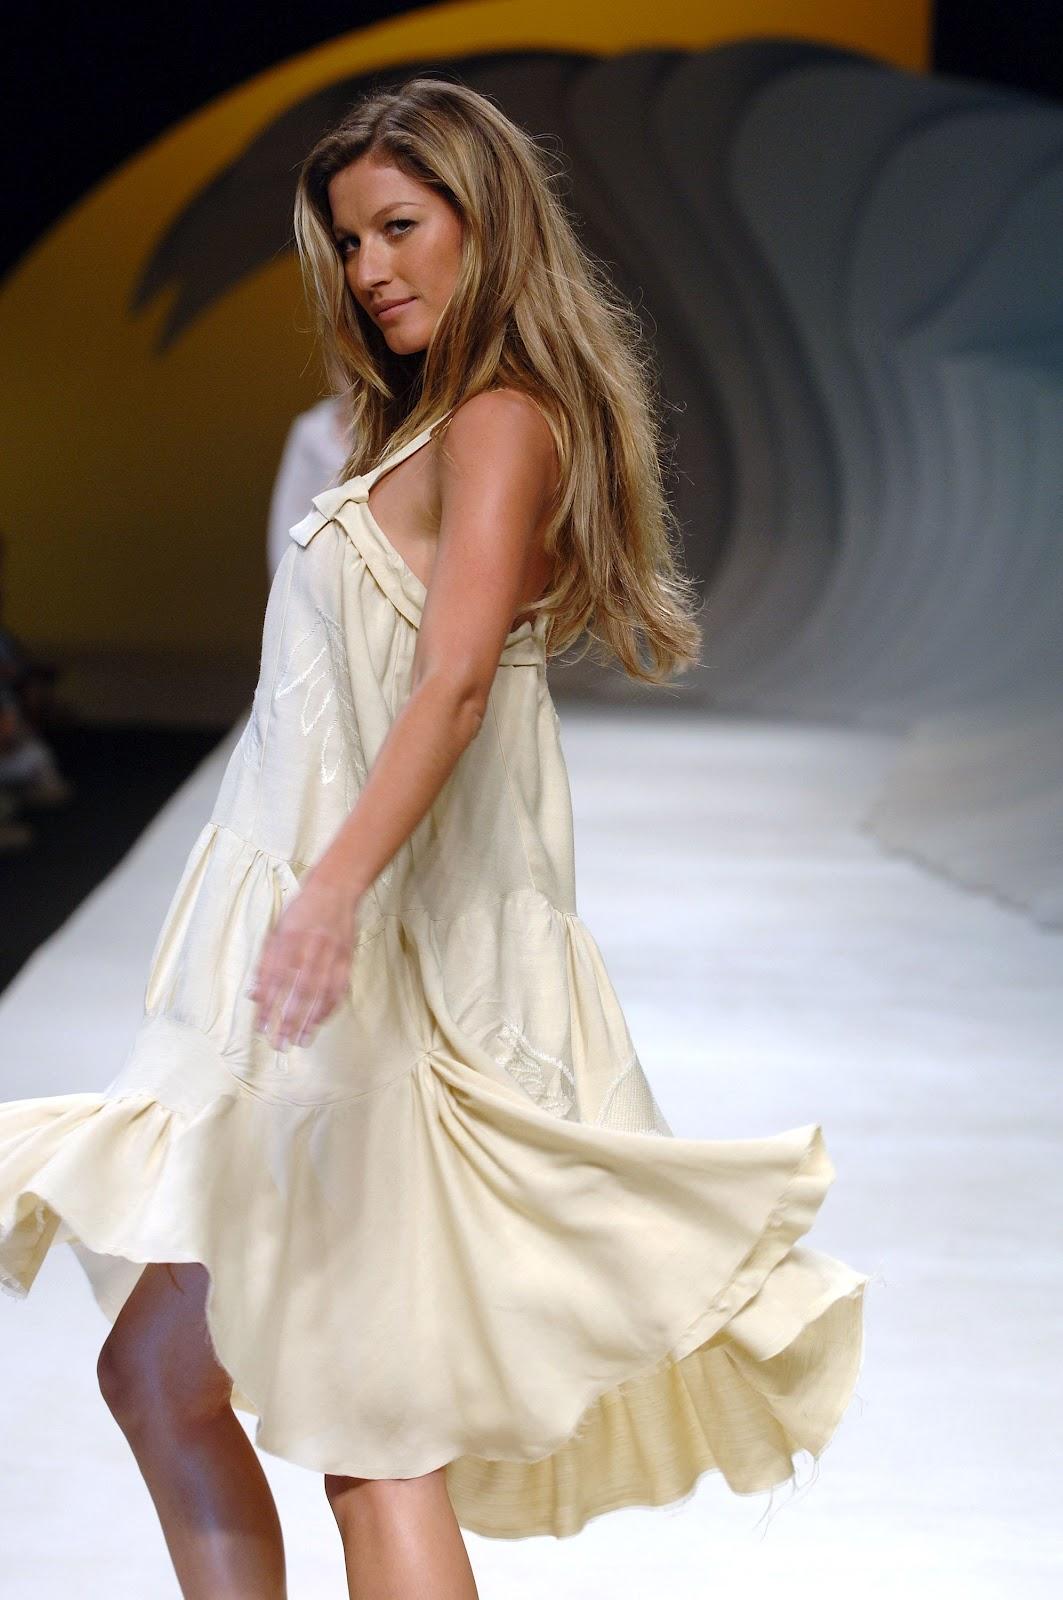 Giselle Model Related Keywords & Suggestions - Giselle ... Gisele Bundchen Wiki